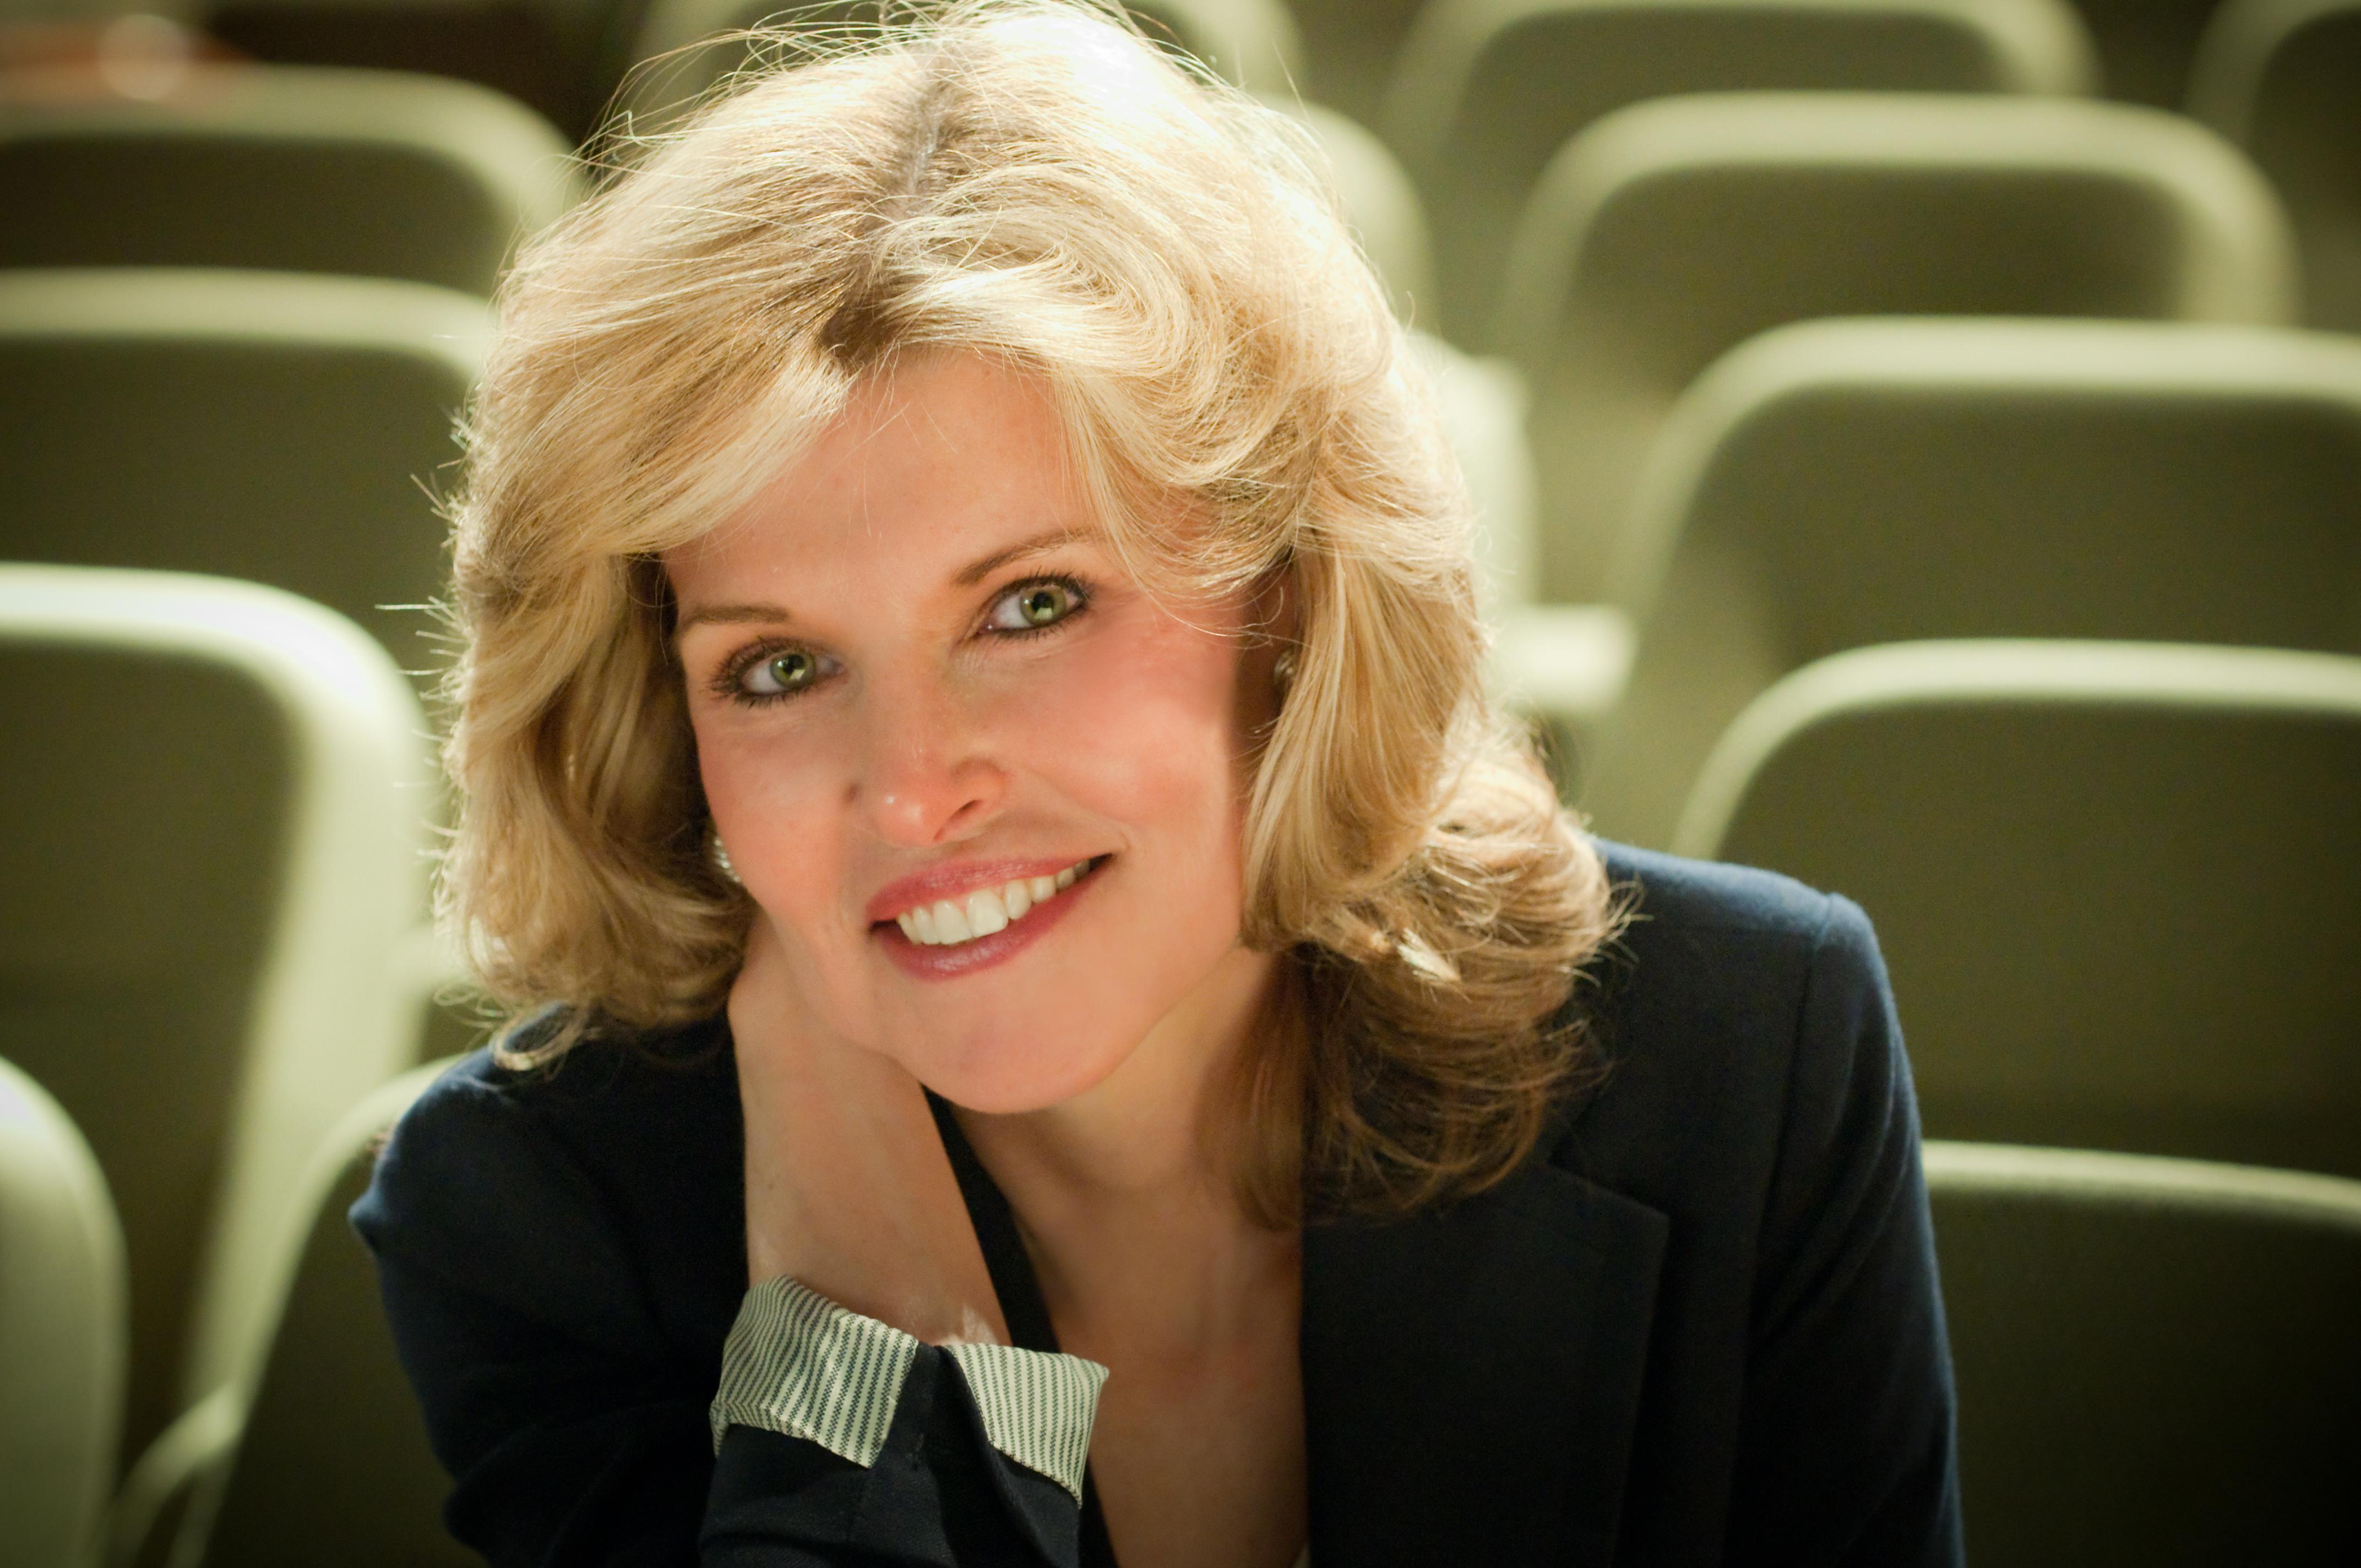 Vicki Hitzges Attitude Change Customer Service